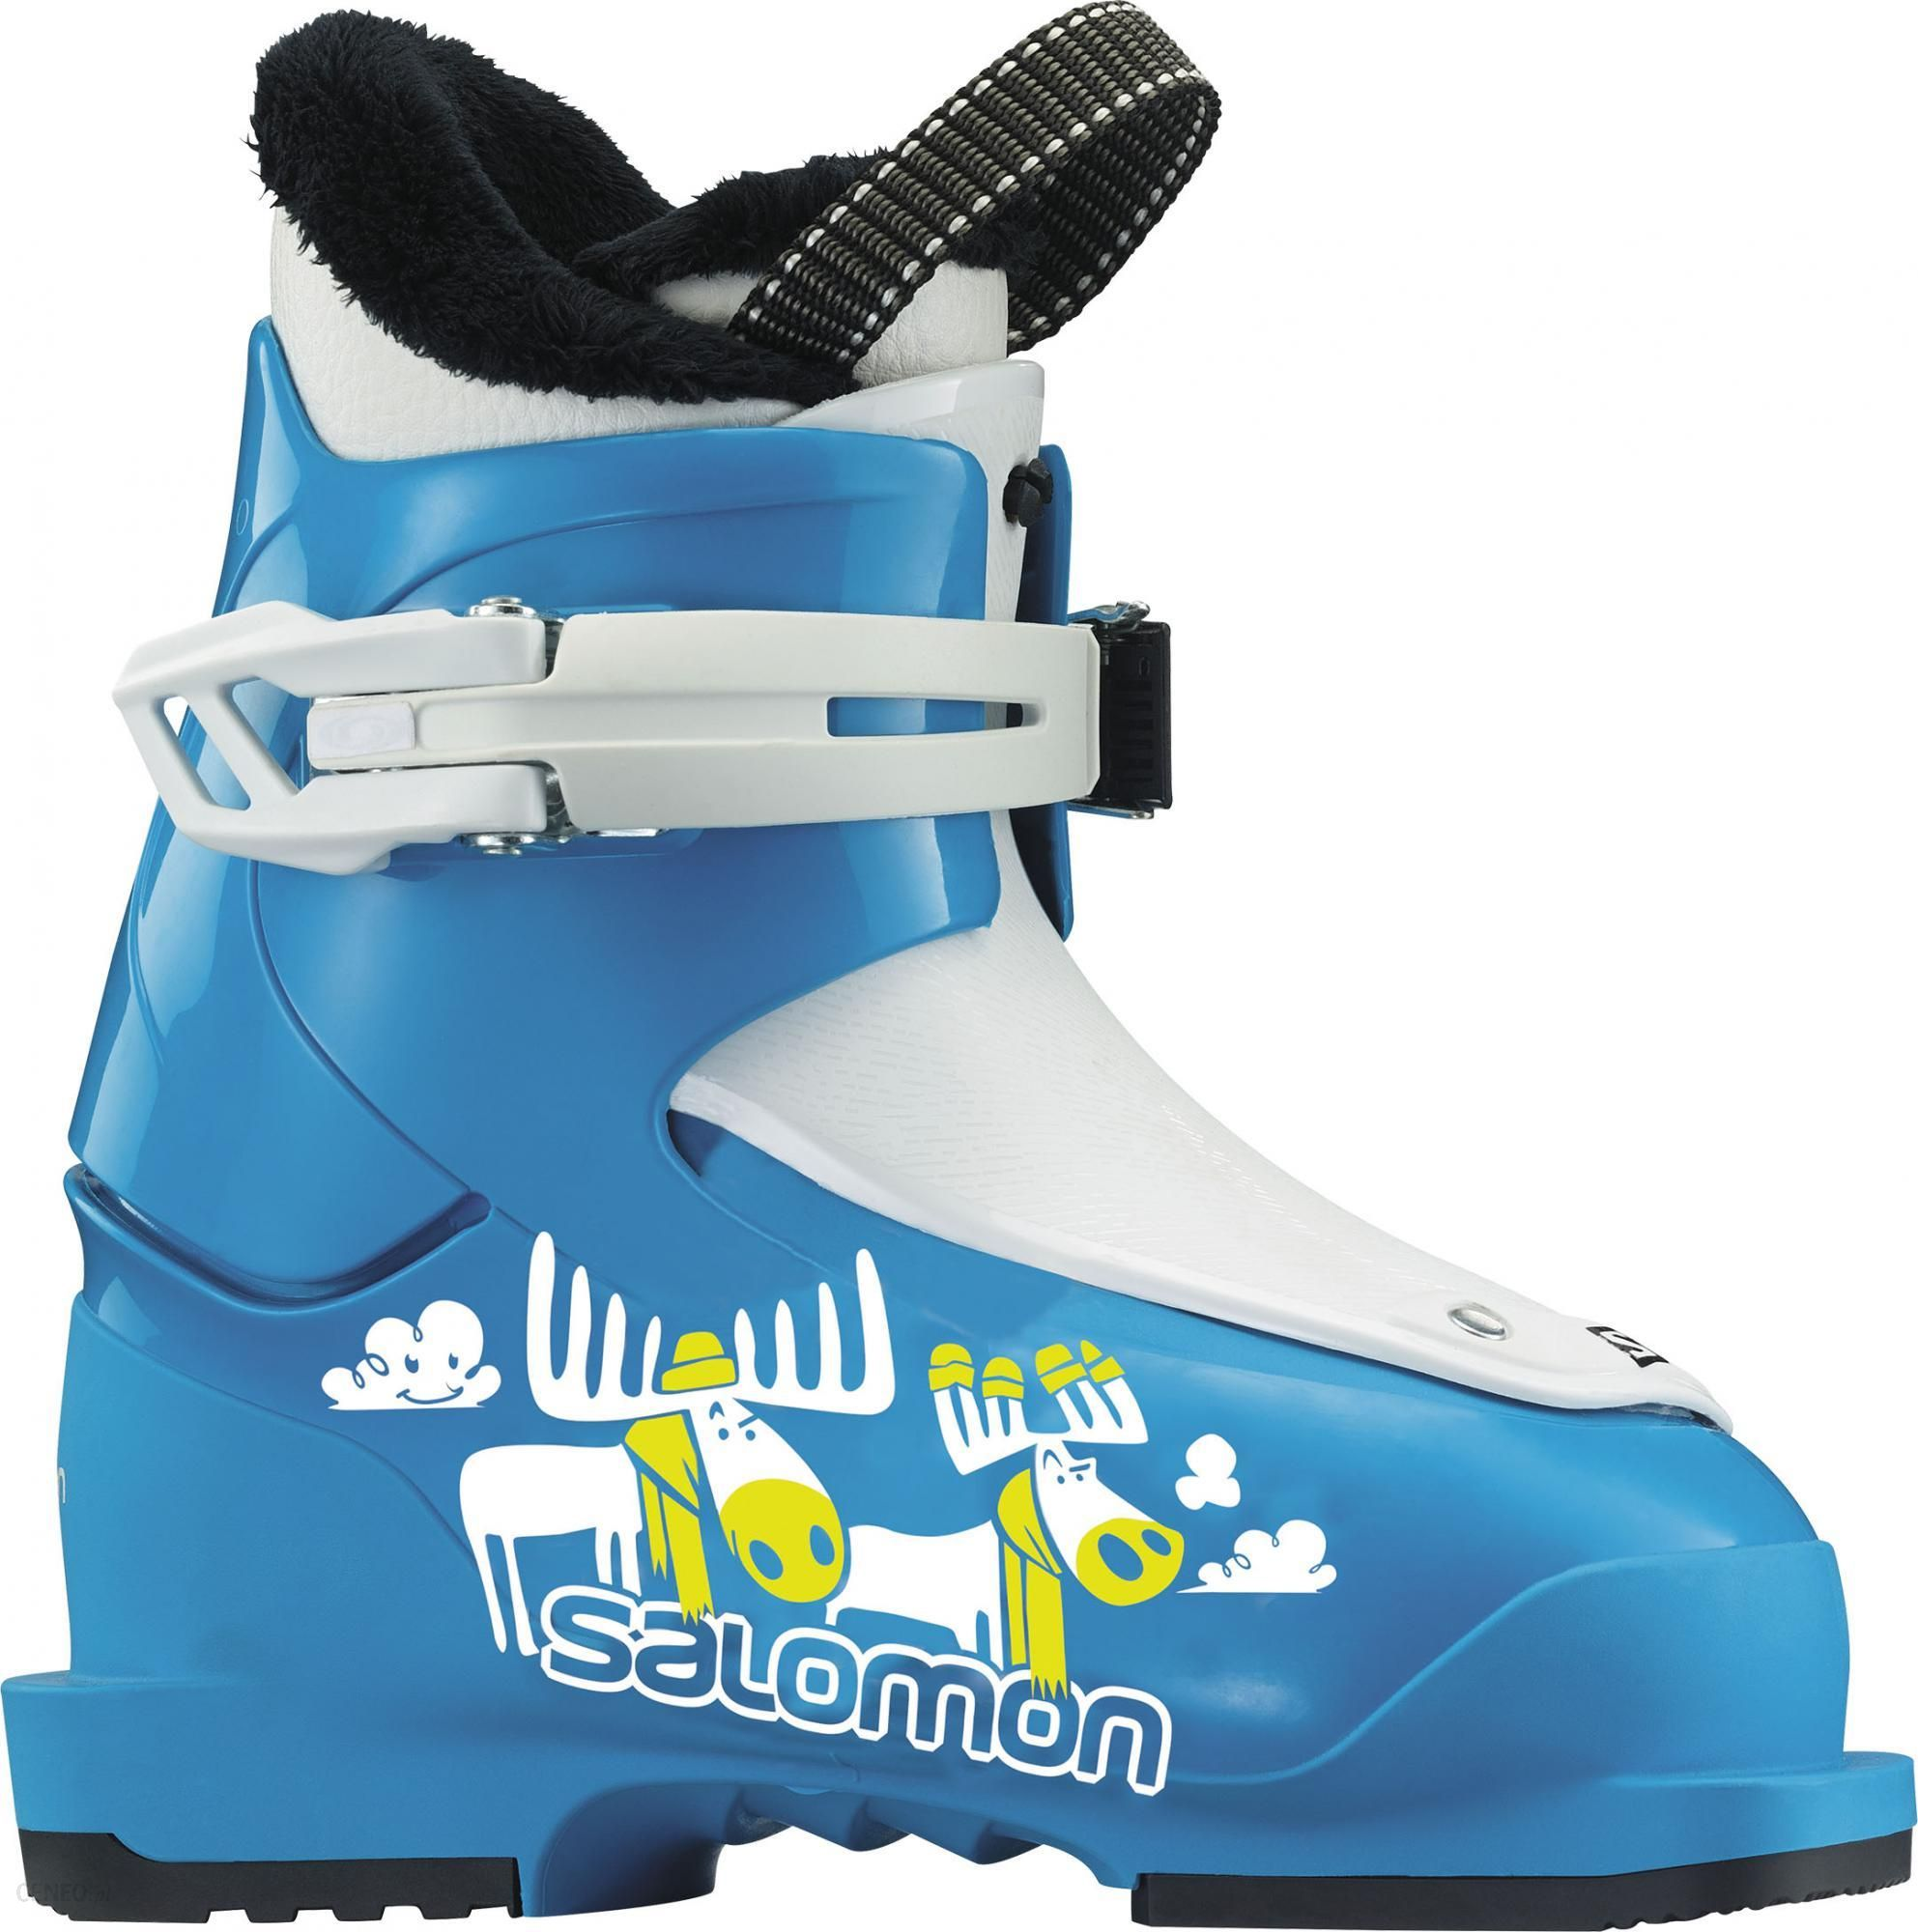 Salomon Team T1 Blue White 1718 18 15Cm Ceny i opinie Ceneo.pl